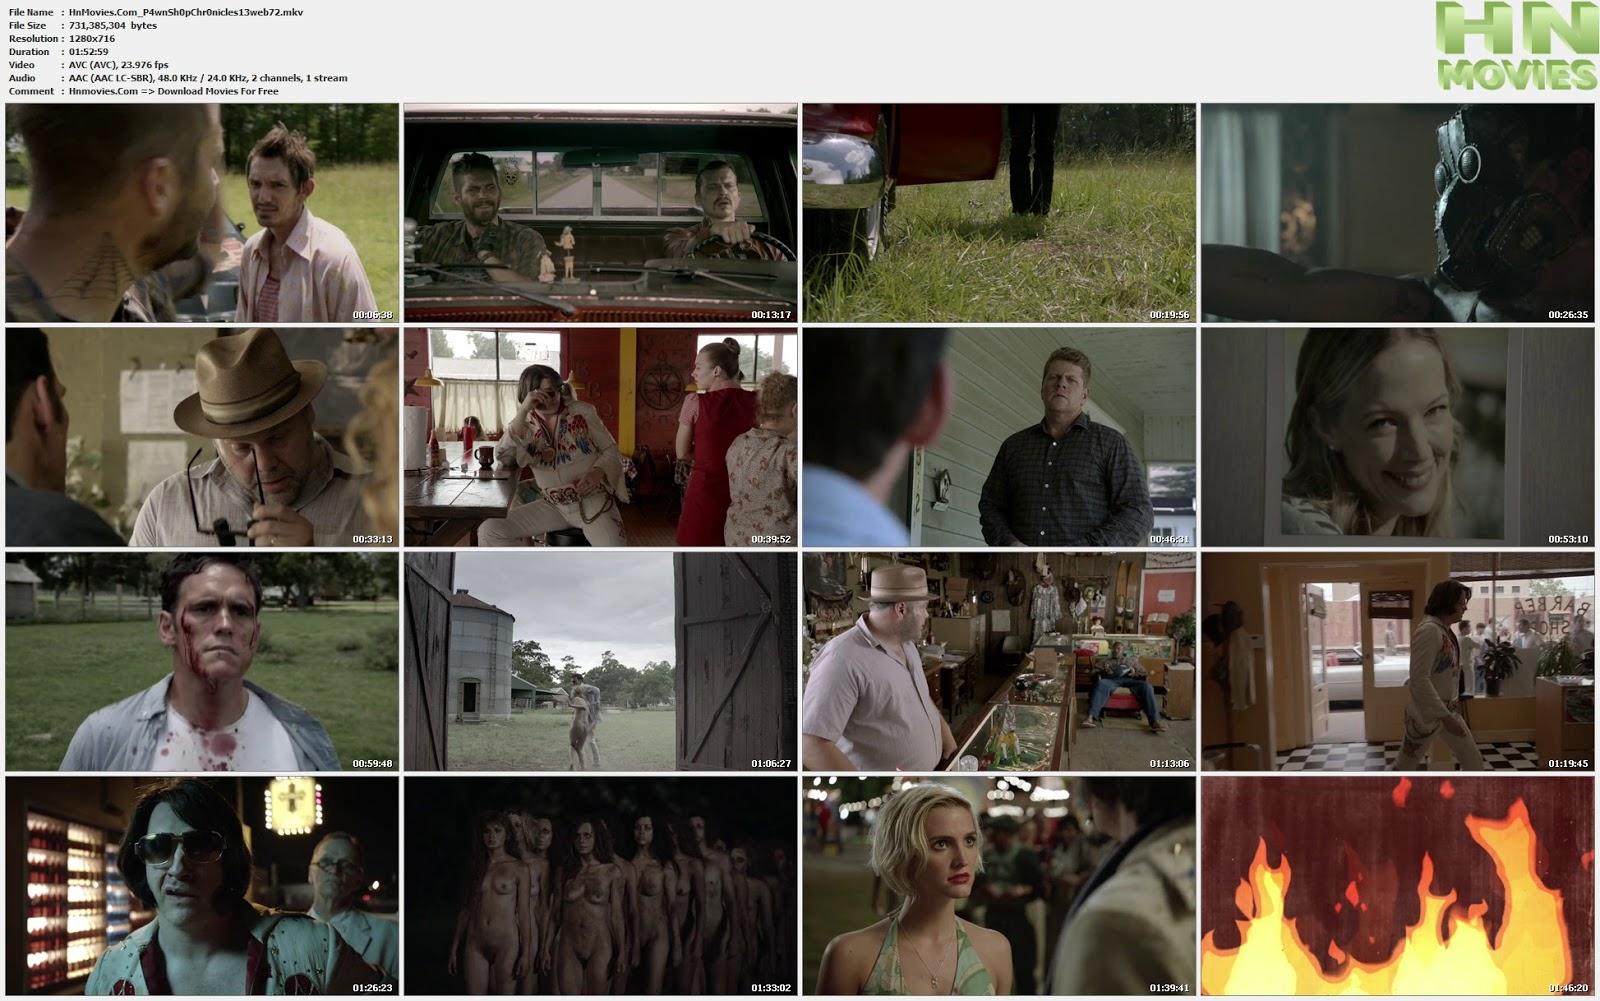 movie screenshot of Pawn Shop Chronicles fdmovie.com